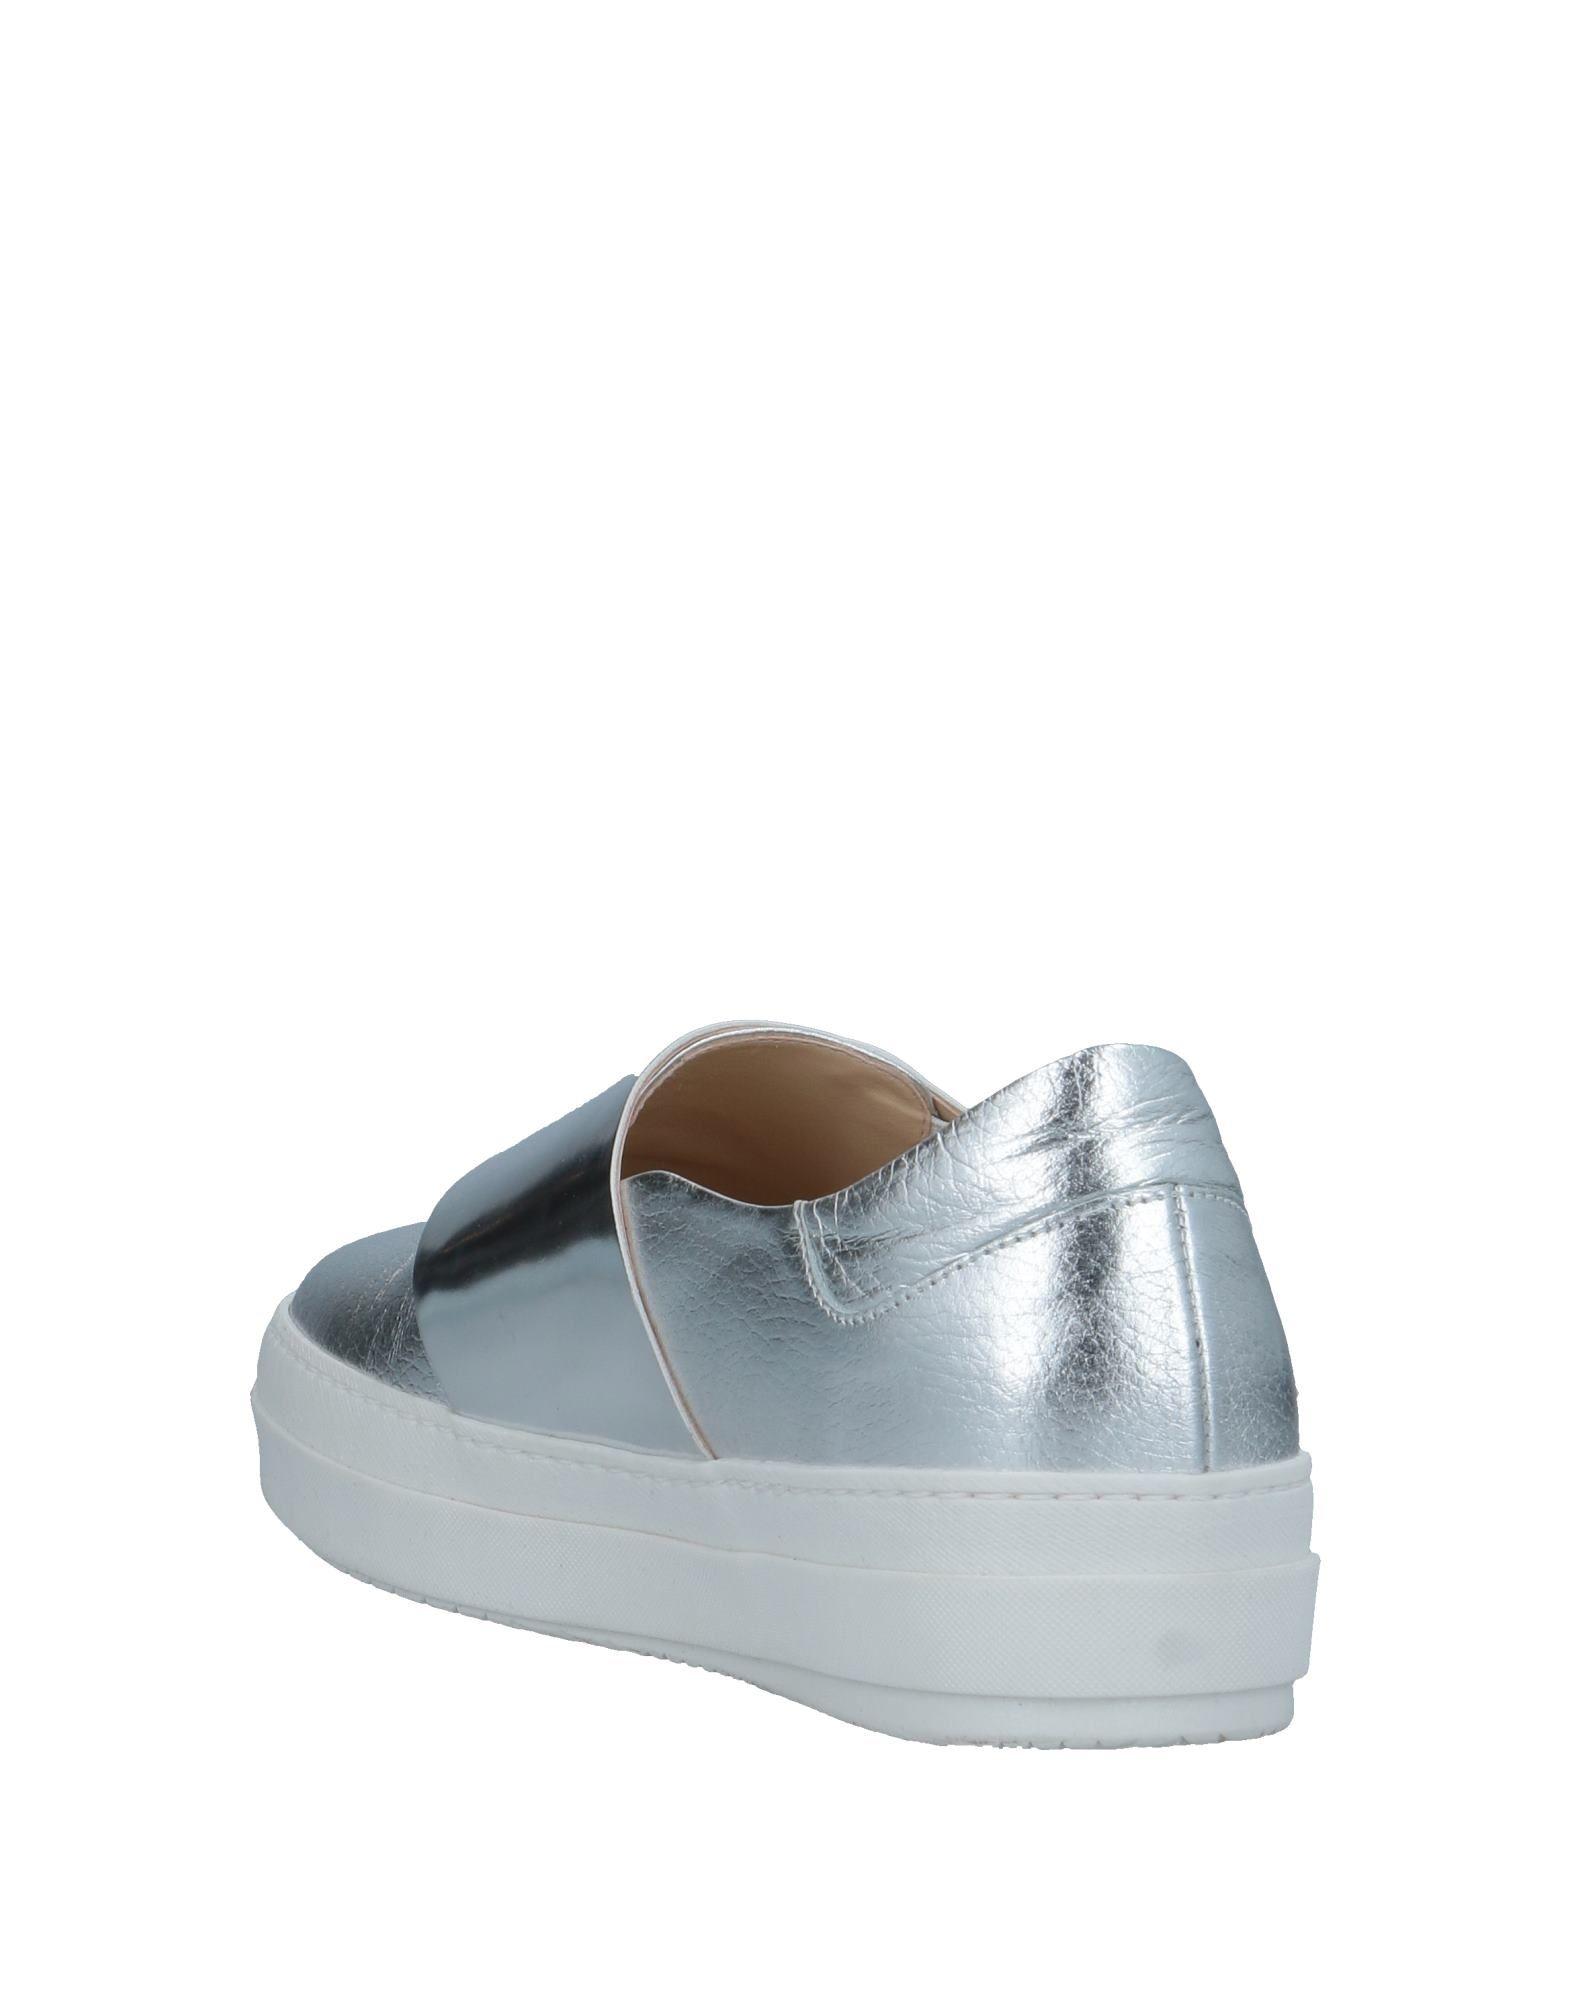 Stilvolle Sneakers billige Schuhe Atos Lombardini Sneakers Stilvolle Damen  11526847WK 40b6d8